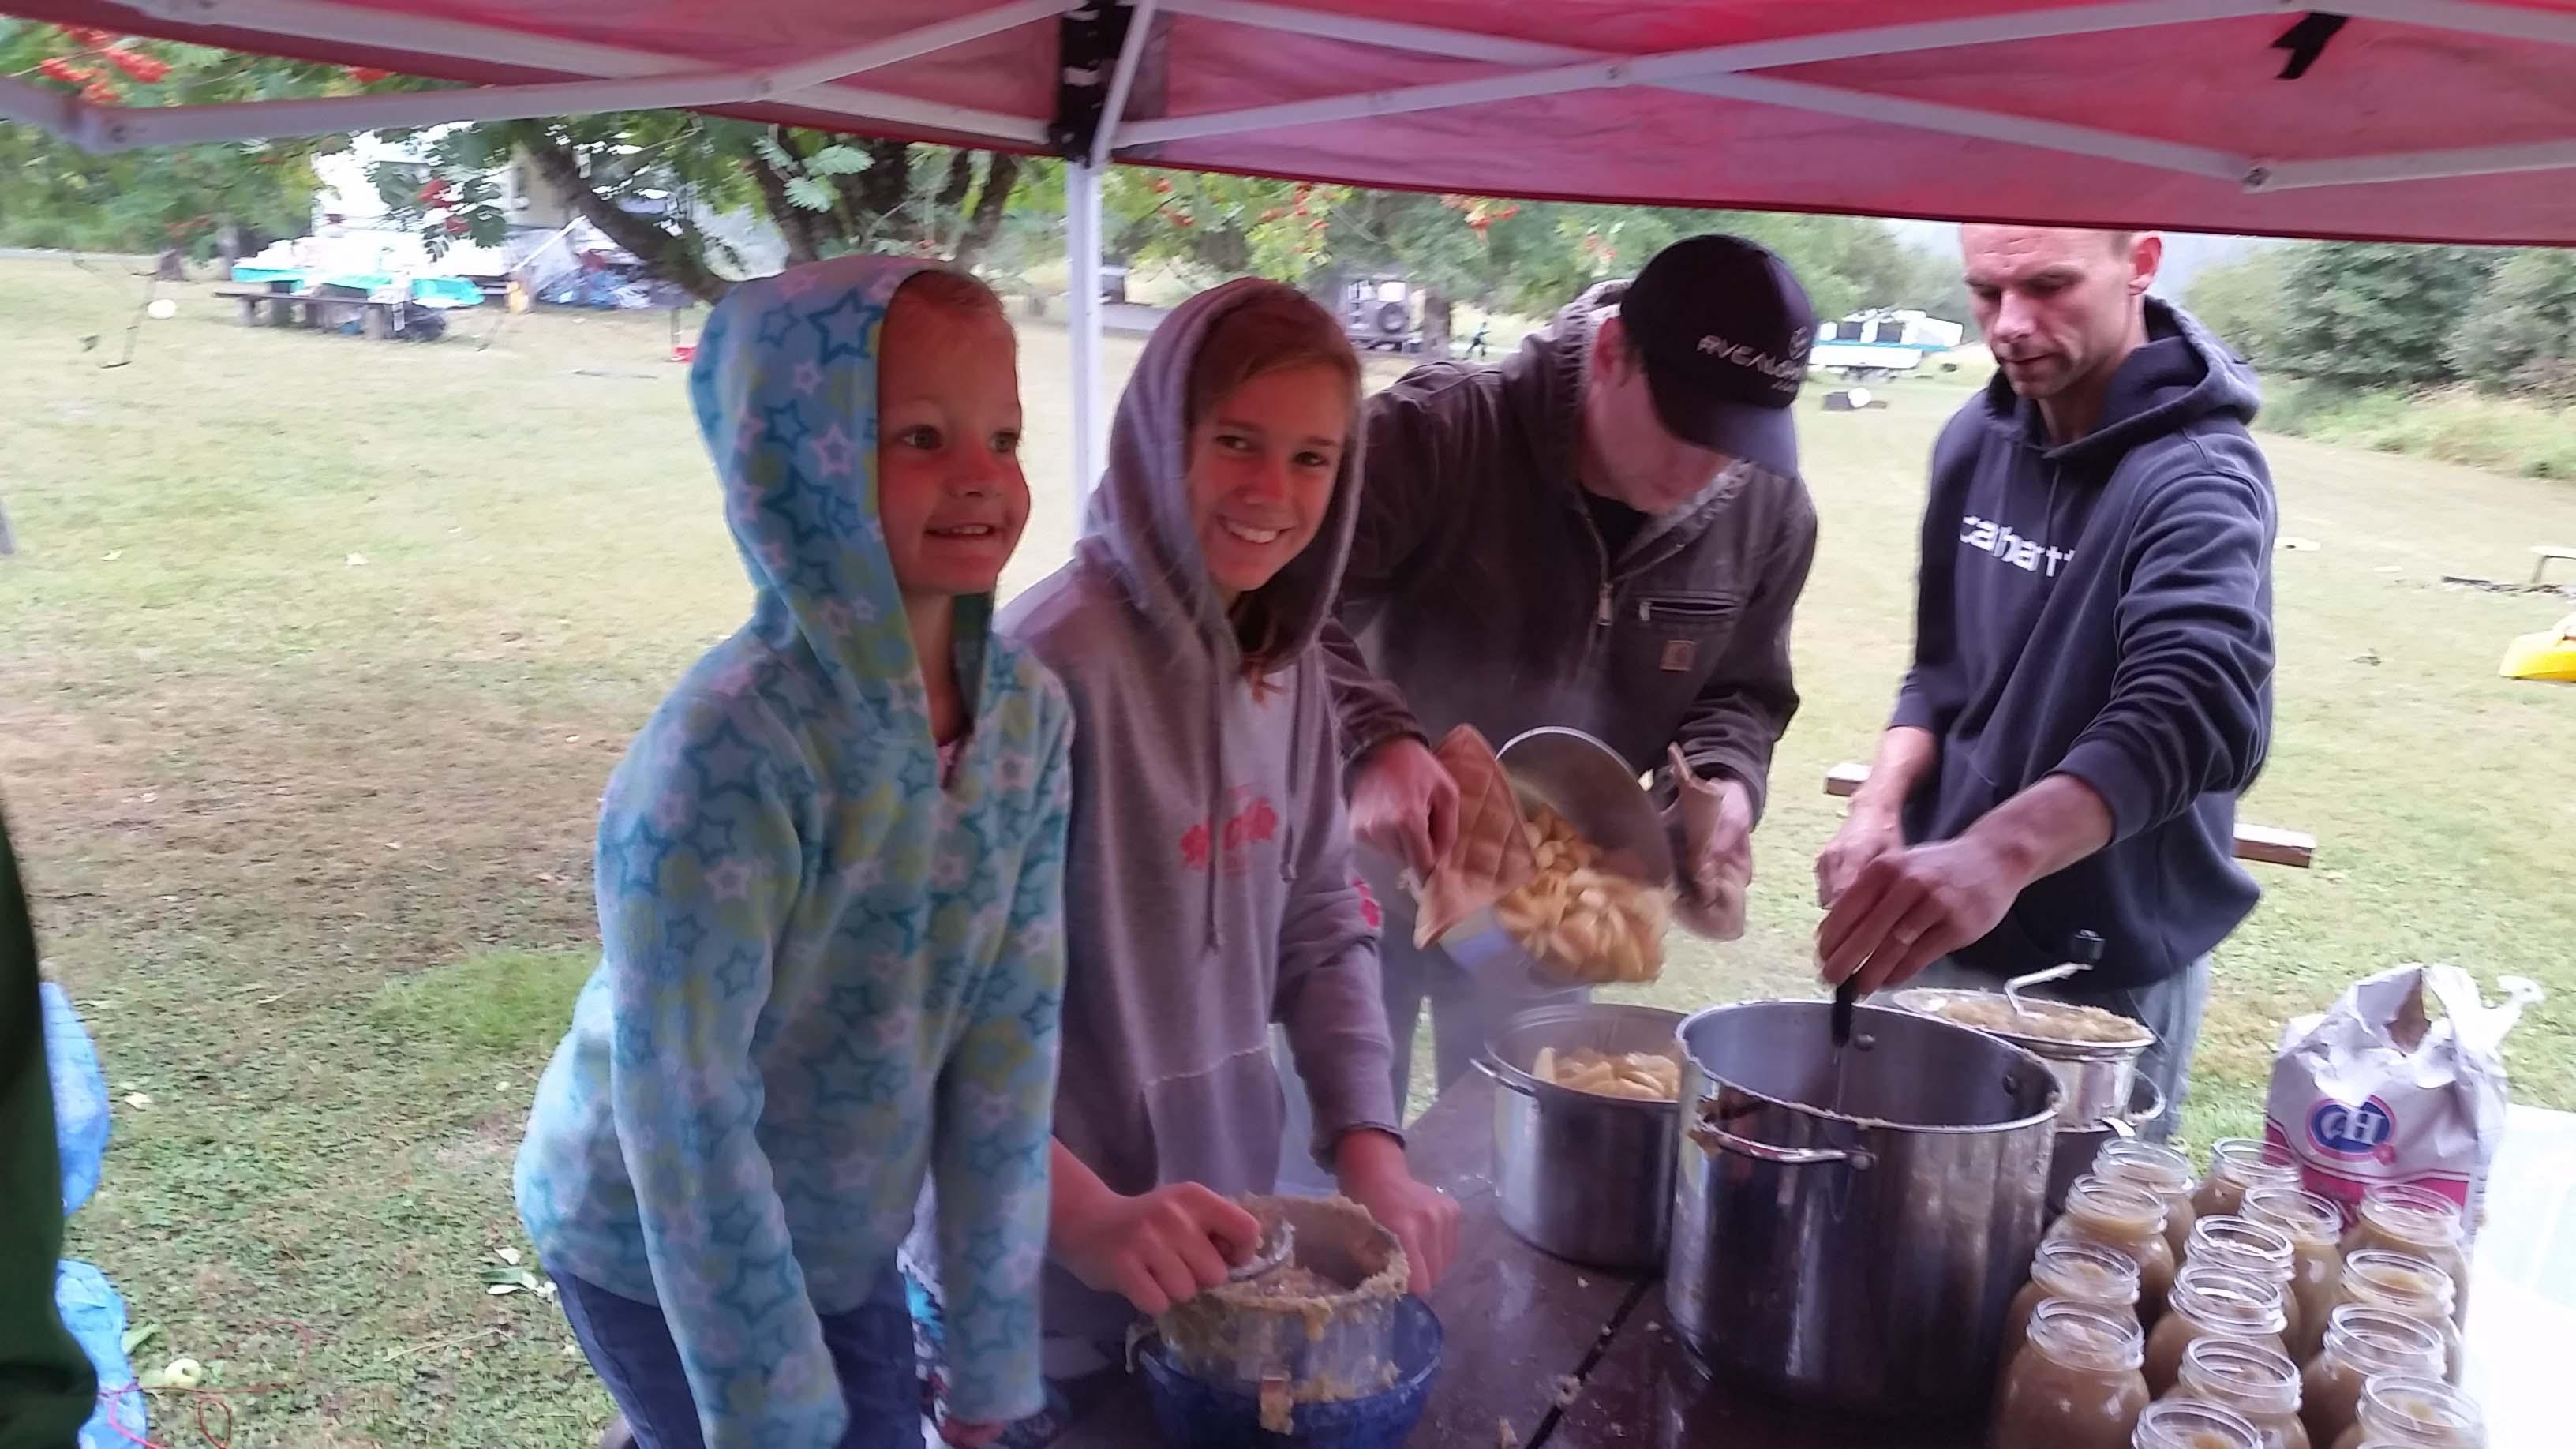 applesauce at camp